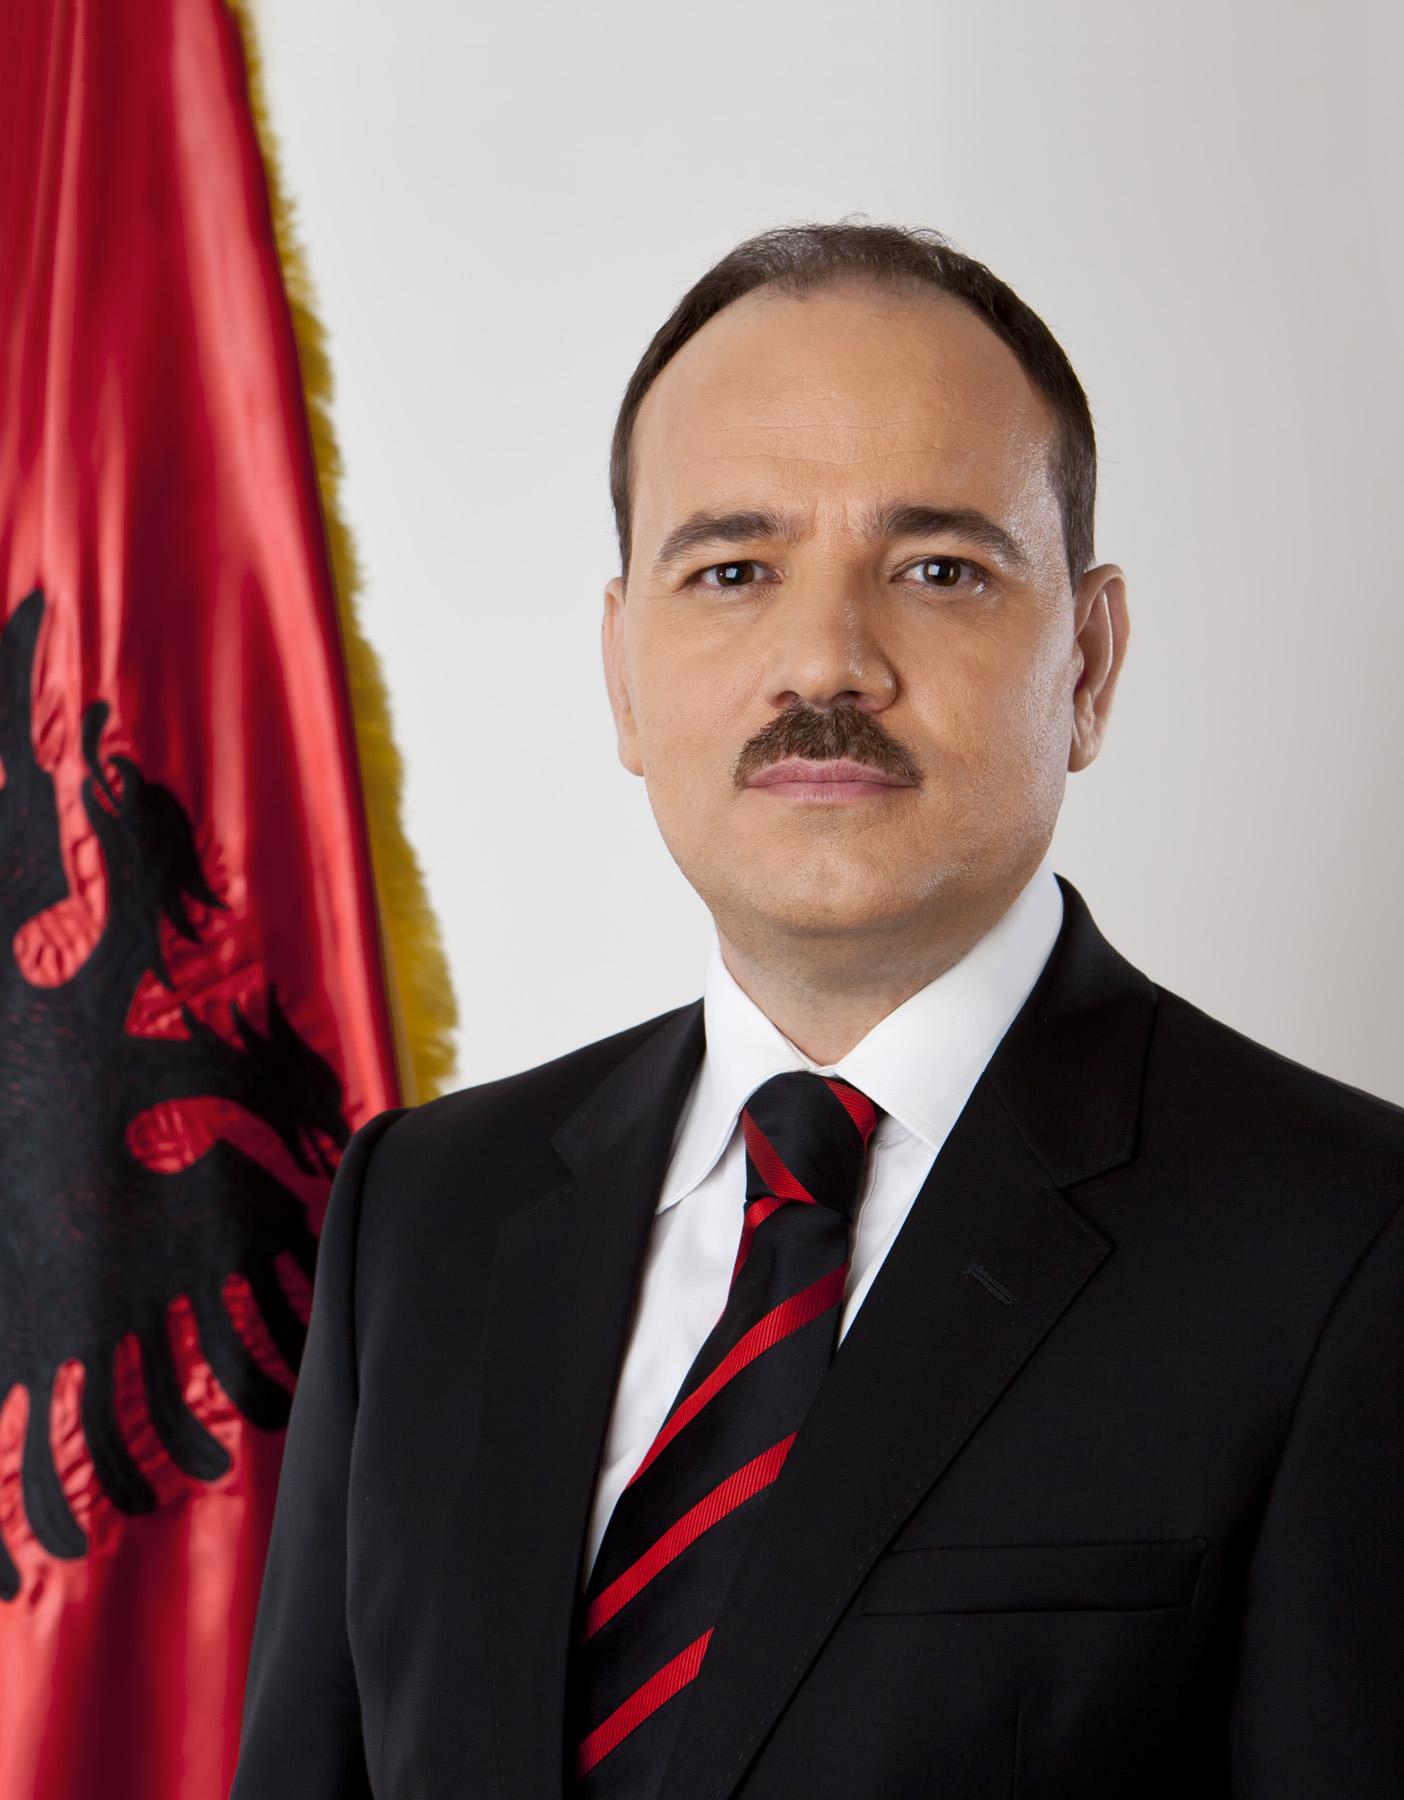 Albanian President Bujar Nishani to Visit Manhattan College